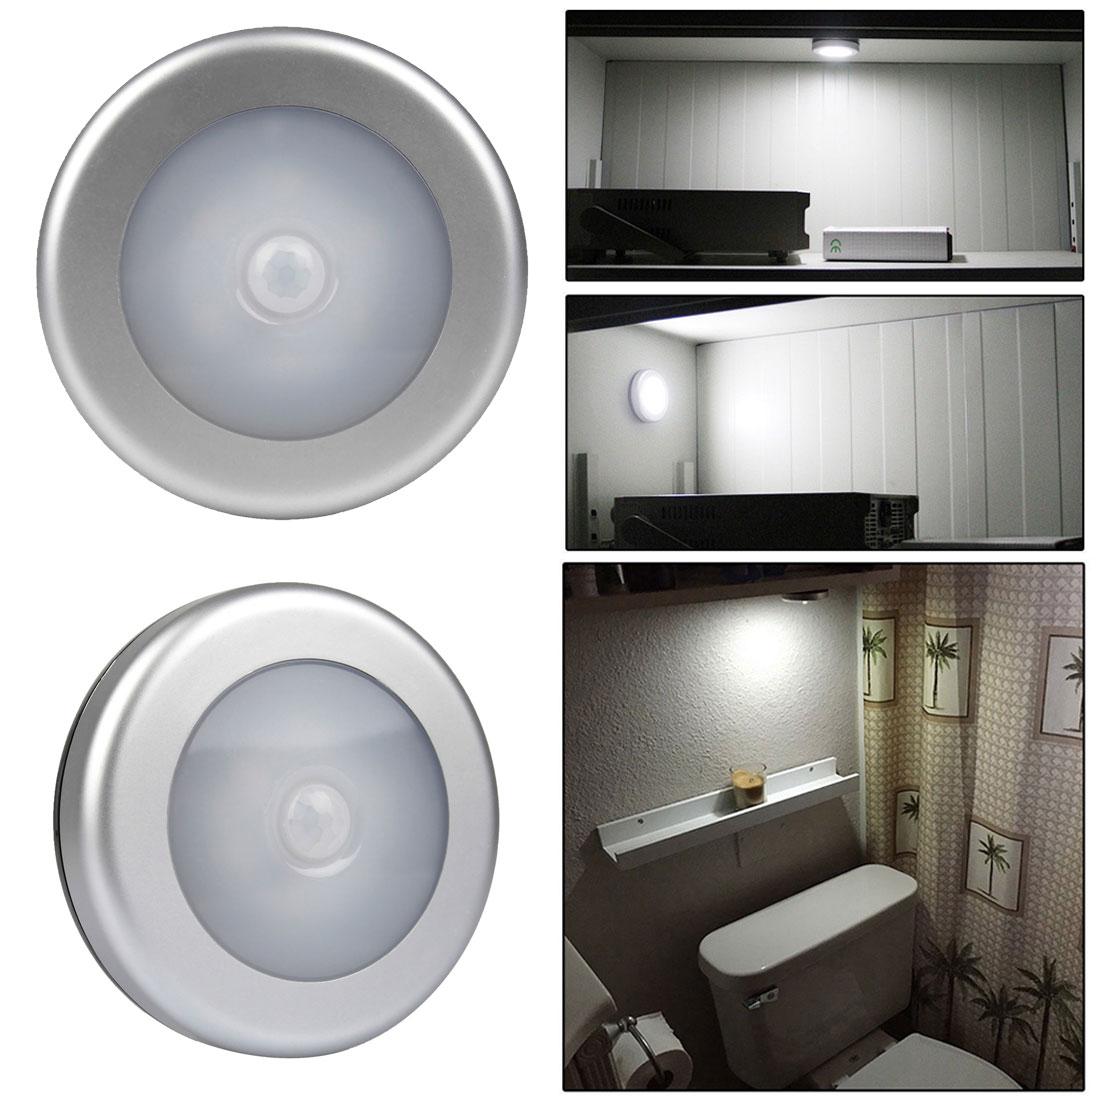 High Quality 6x white LED Wireless PIR Motion Sensor Light Cabinet Wardrobe Wall Lamp Battery Powered mini wireless pir motion sensor night light battery powered porch cabinet lamp